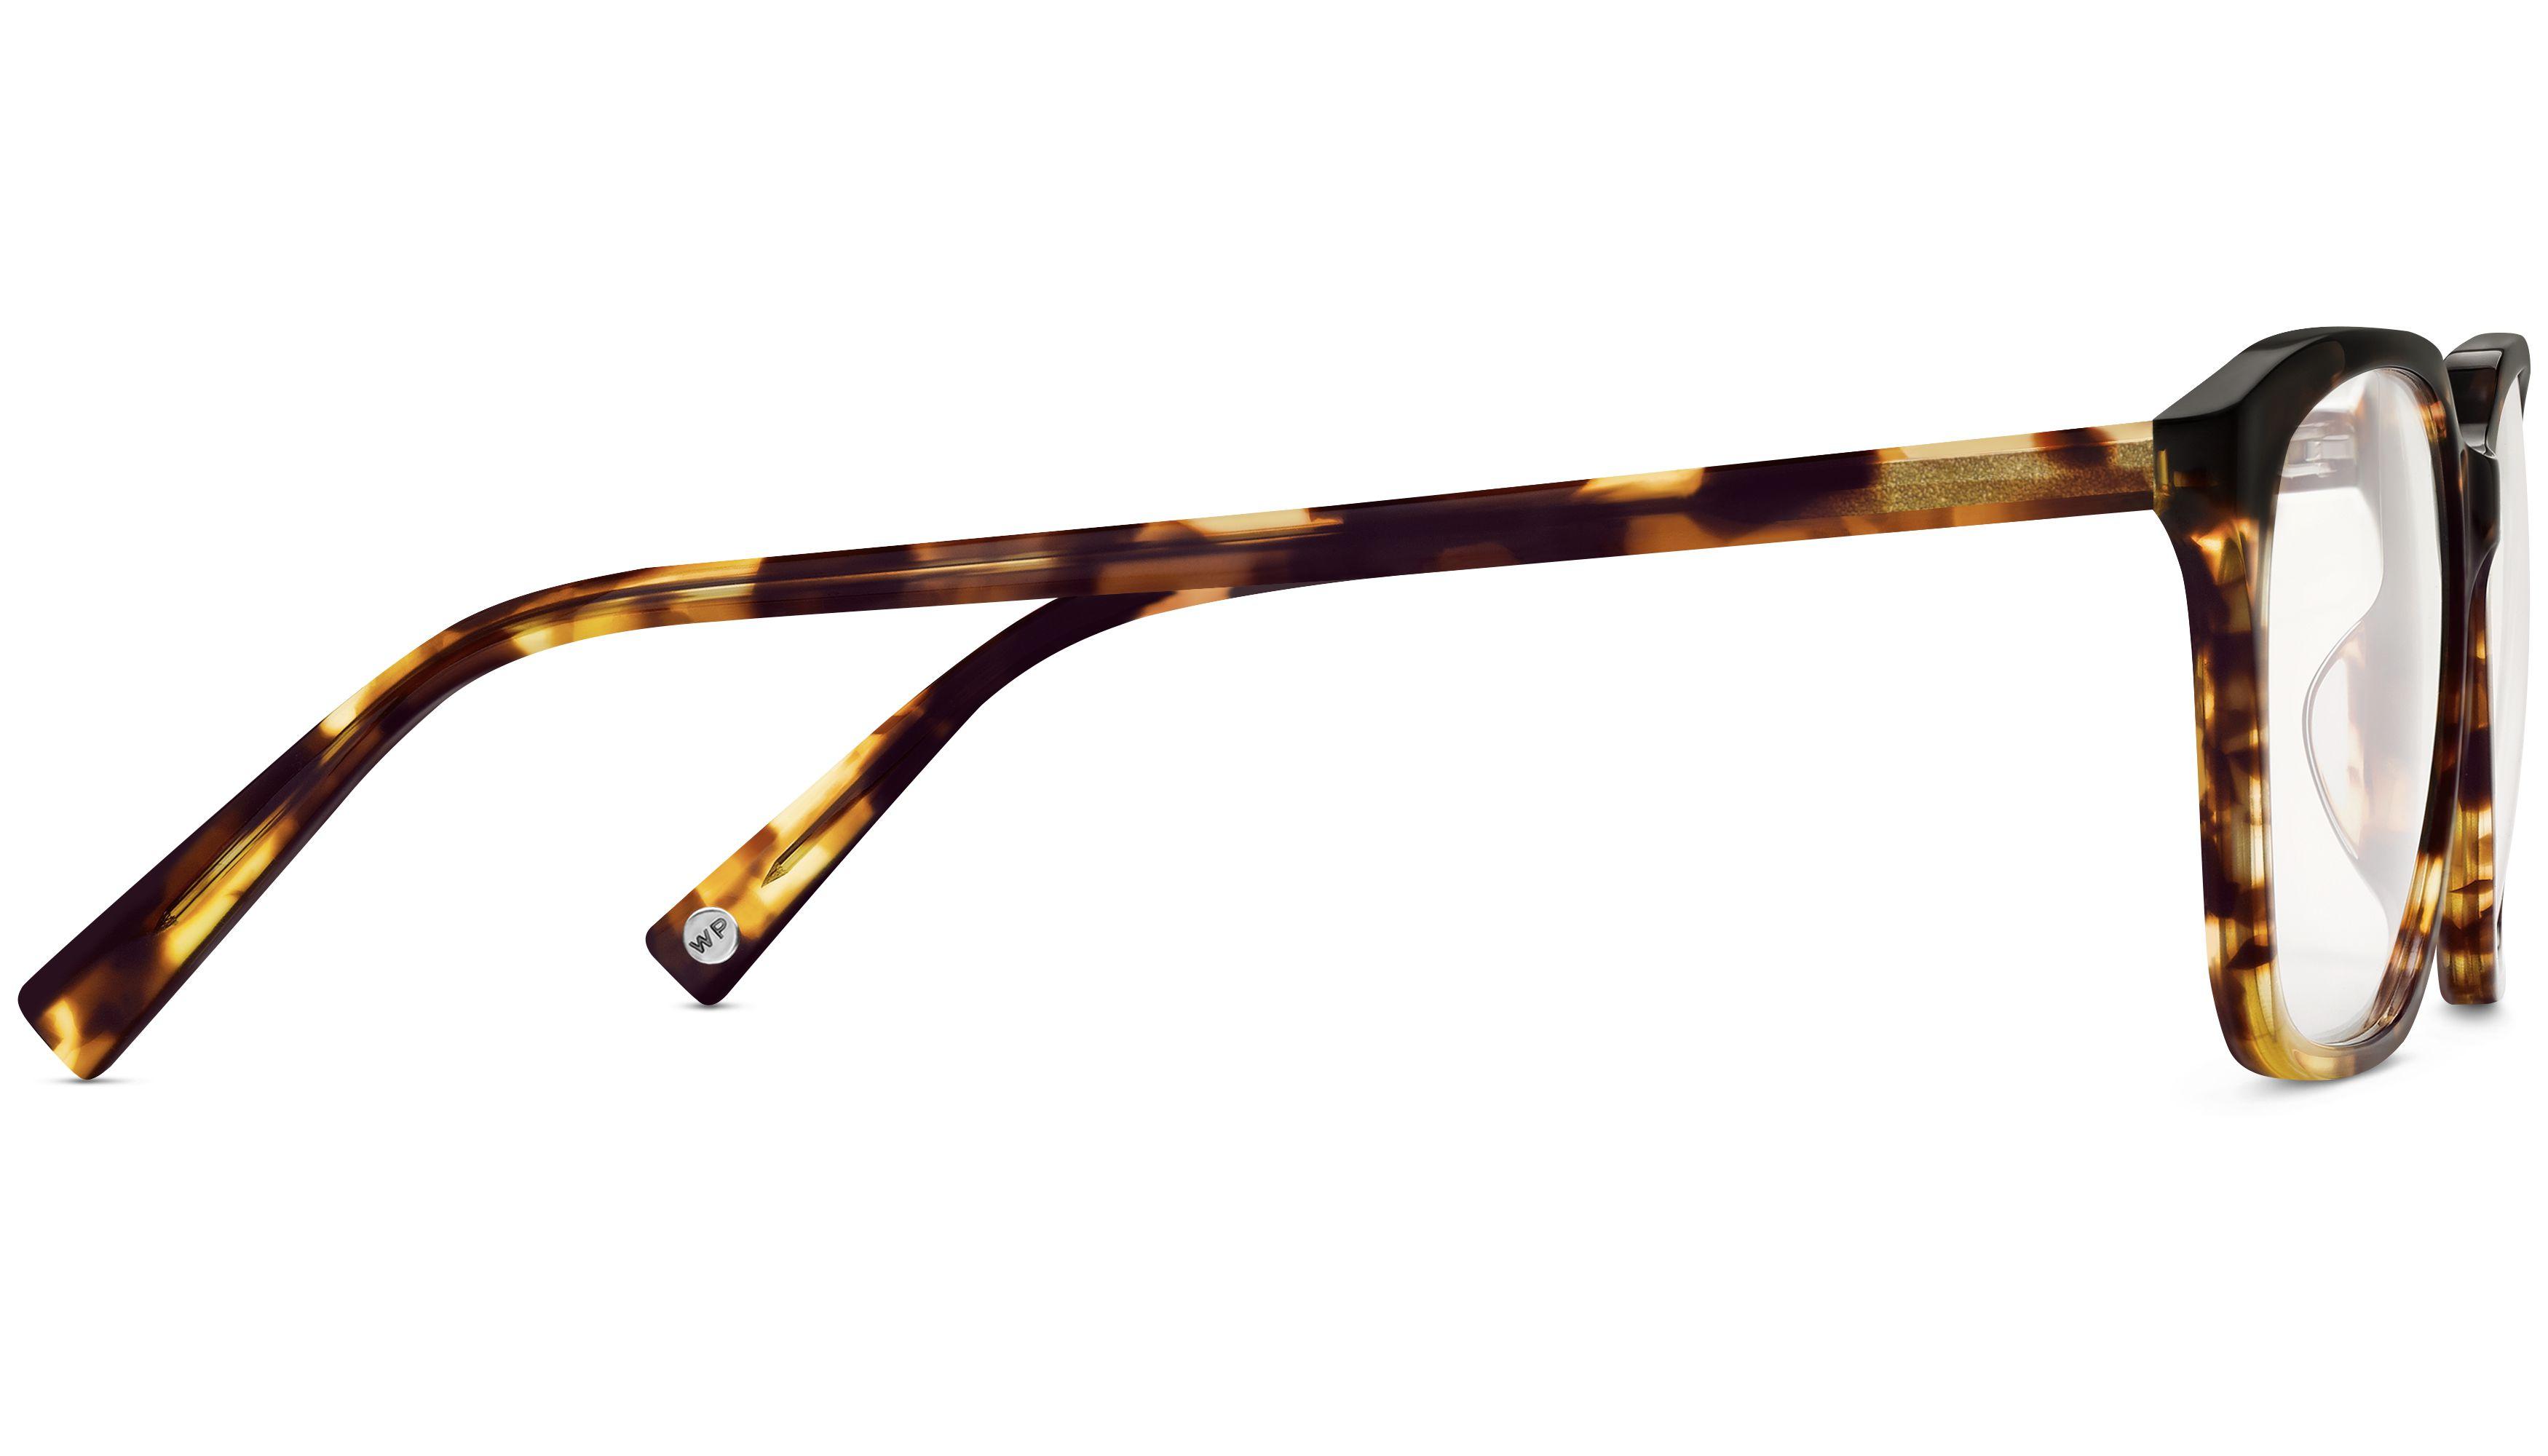 Barnes Eyeglasses in Root Beer for Women | Warby Parker